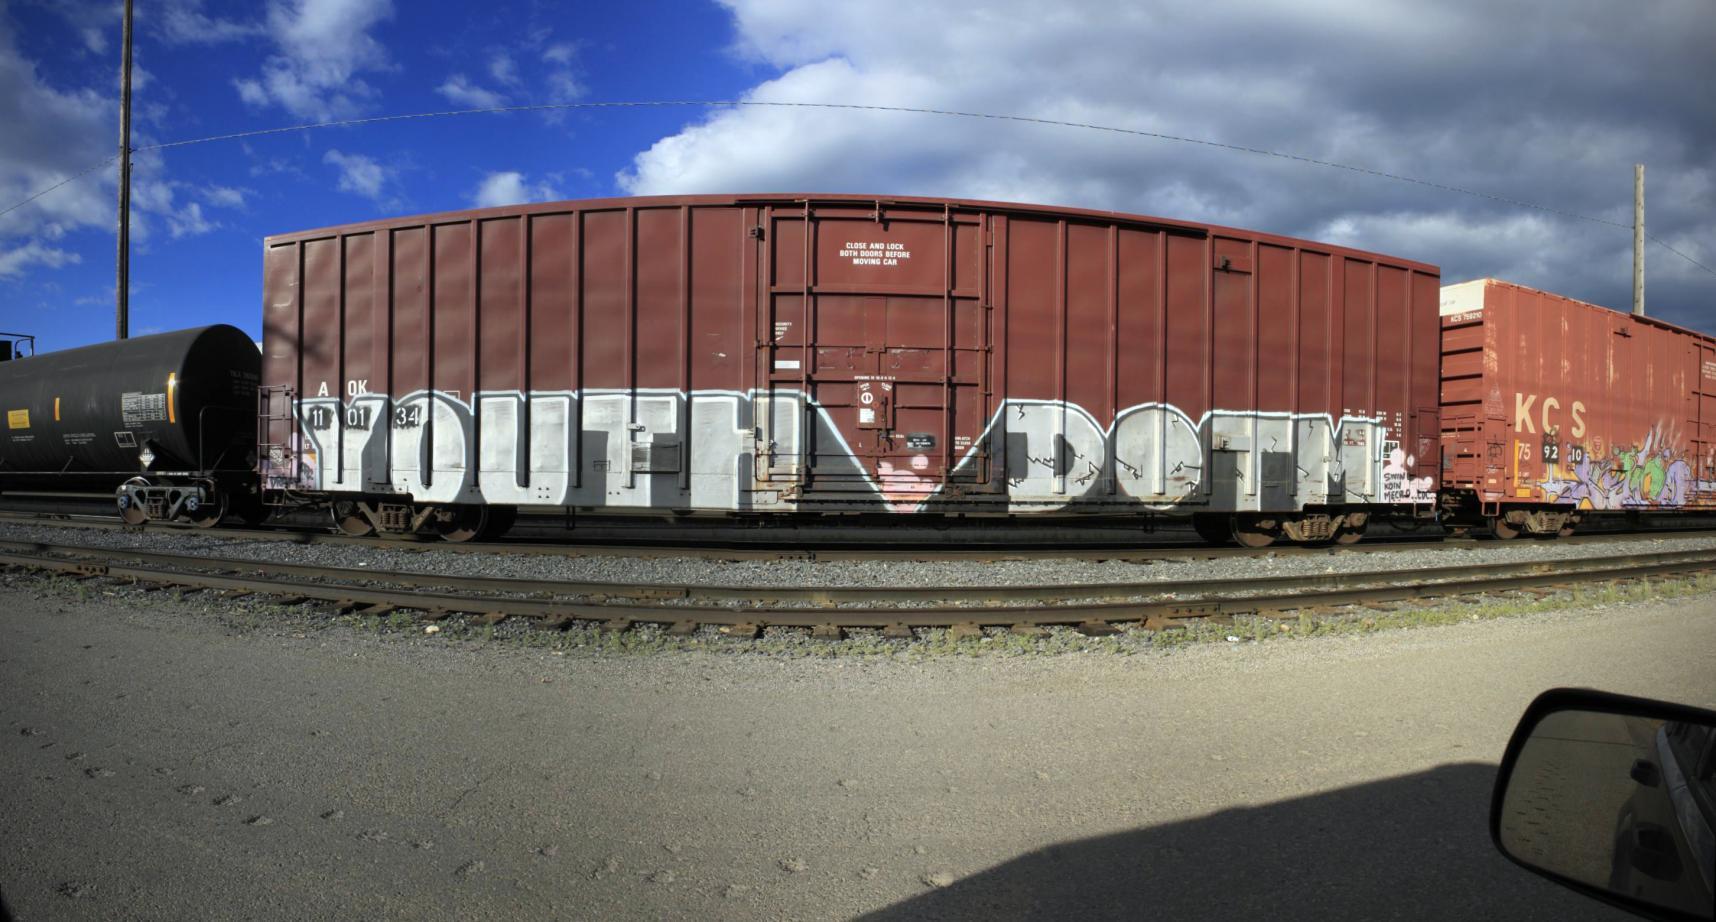 Youth Dotm.jpg